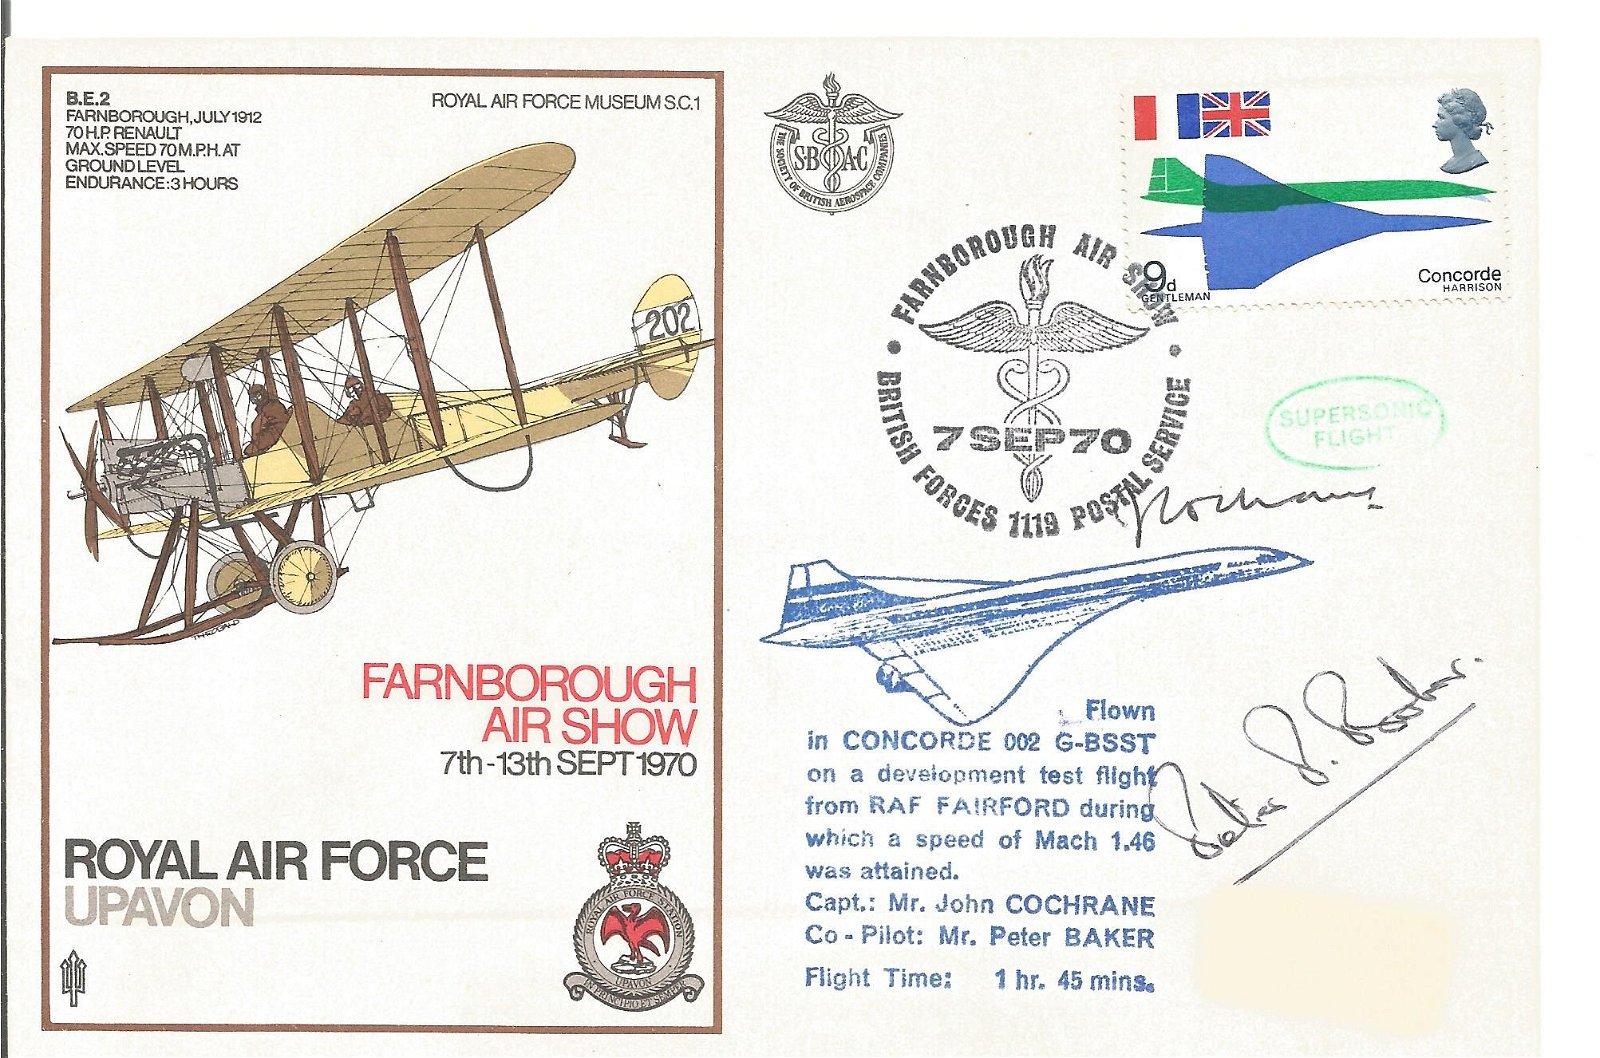 Concorde captains John Cochrane and Peter Baker double